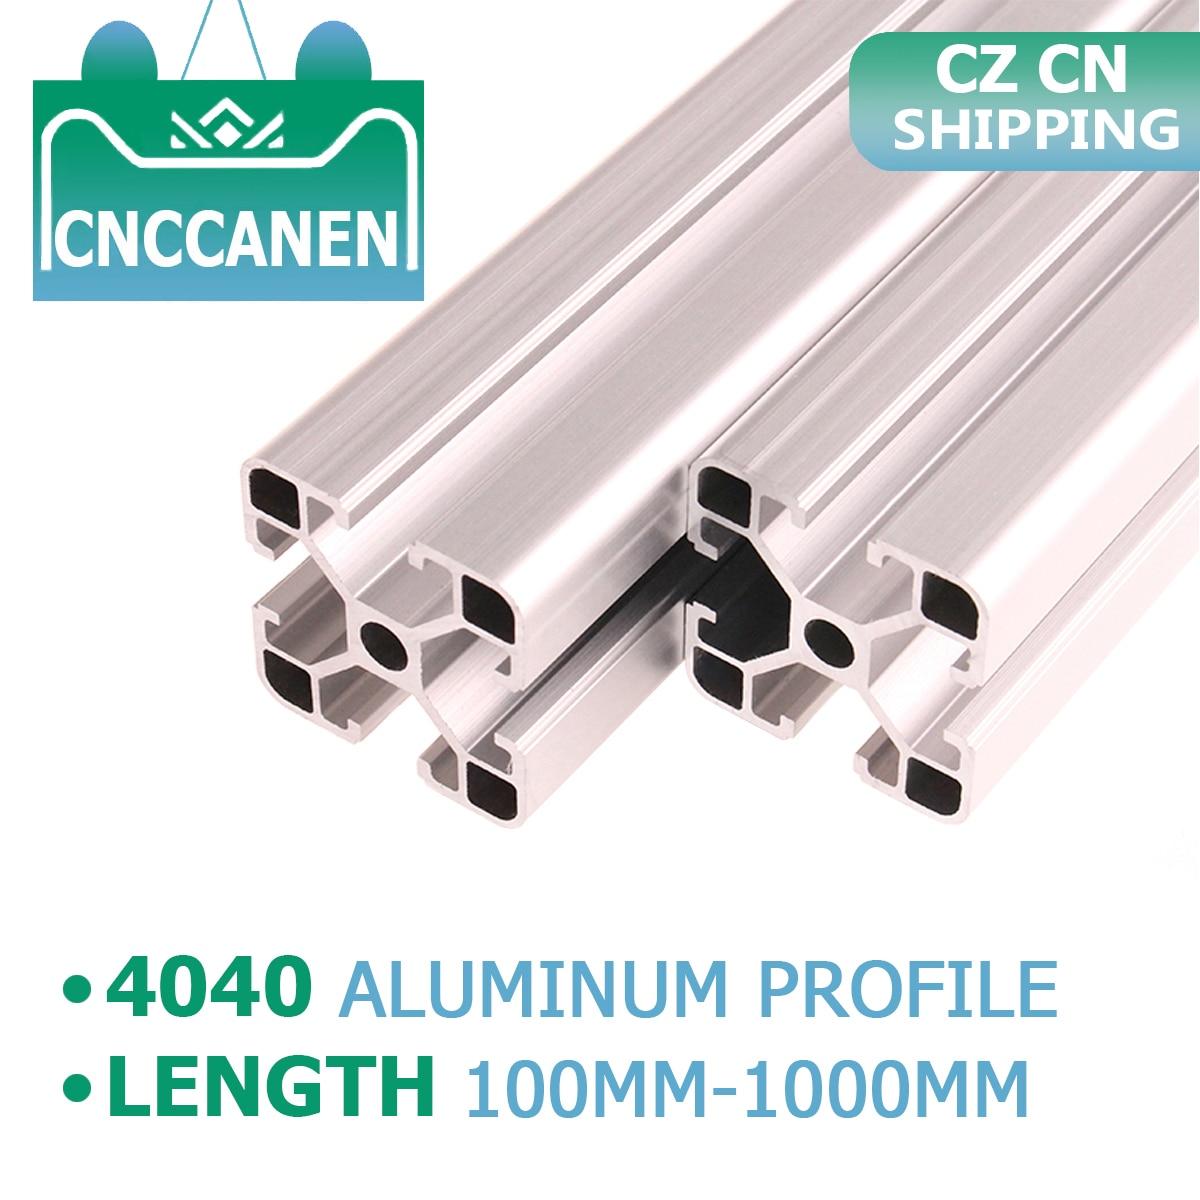 CZ CN Shipping 2PCS 4040 Aluminum Profile Extrusion 100mm-1000mm Length European Standard Anodized For CNC 3D Printer Parts DIY